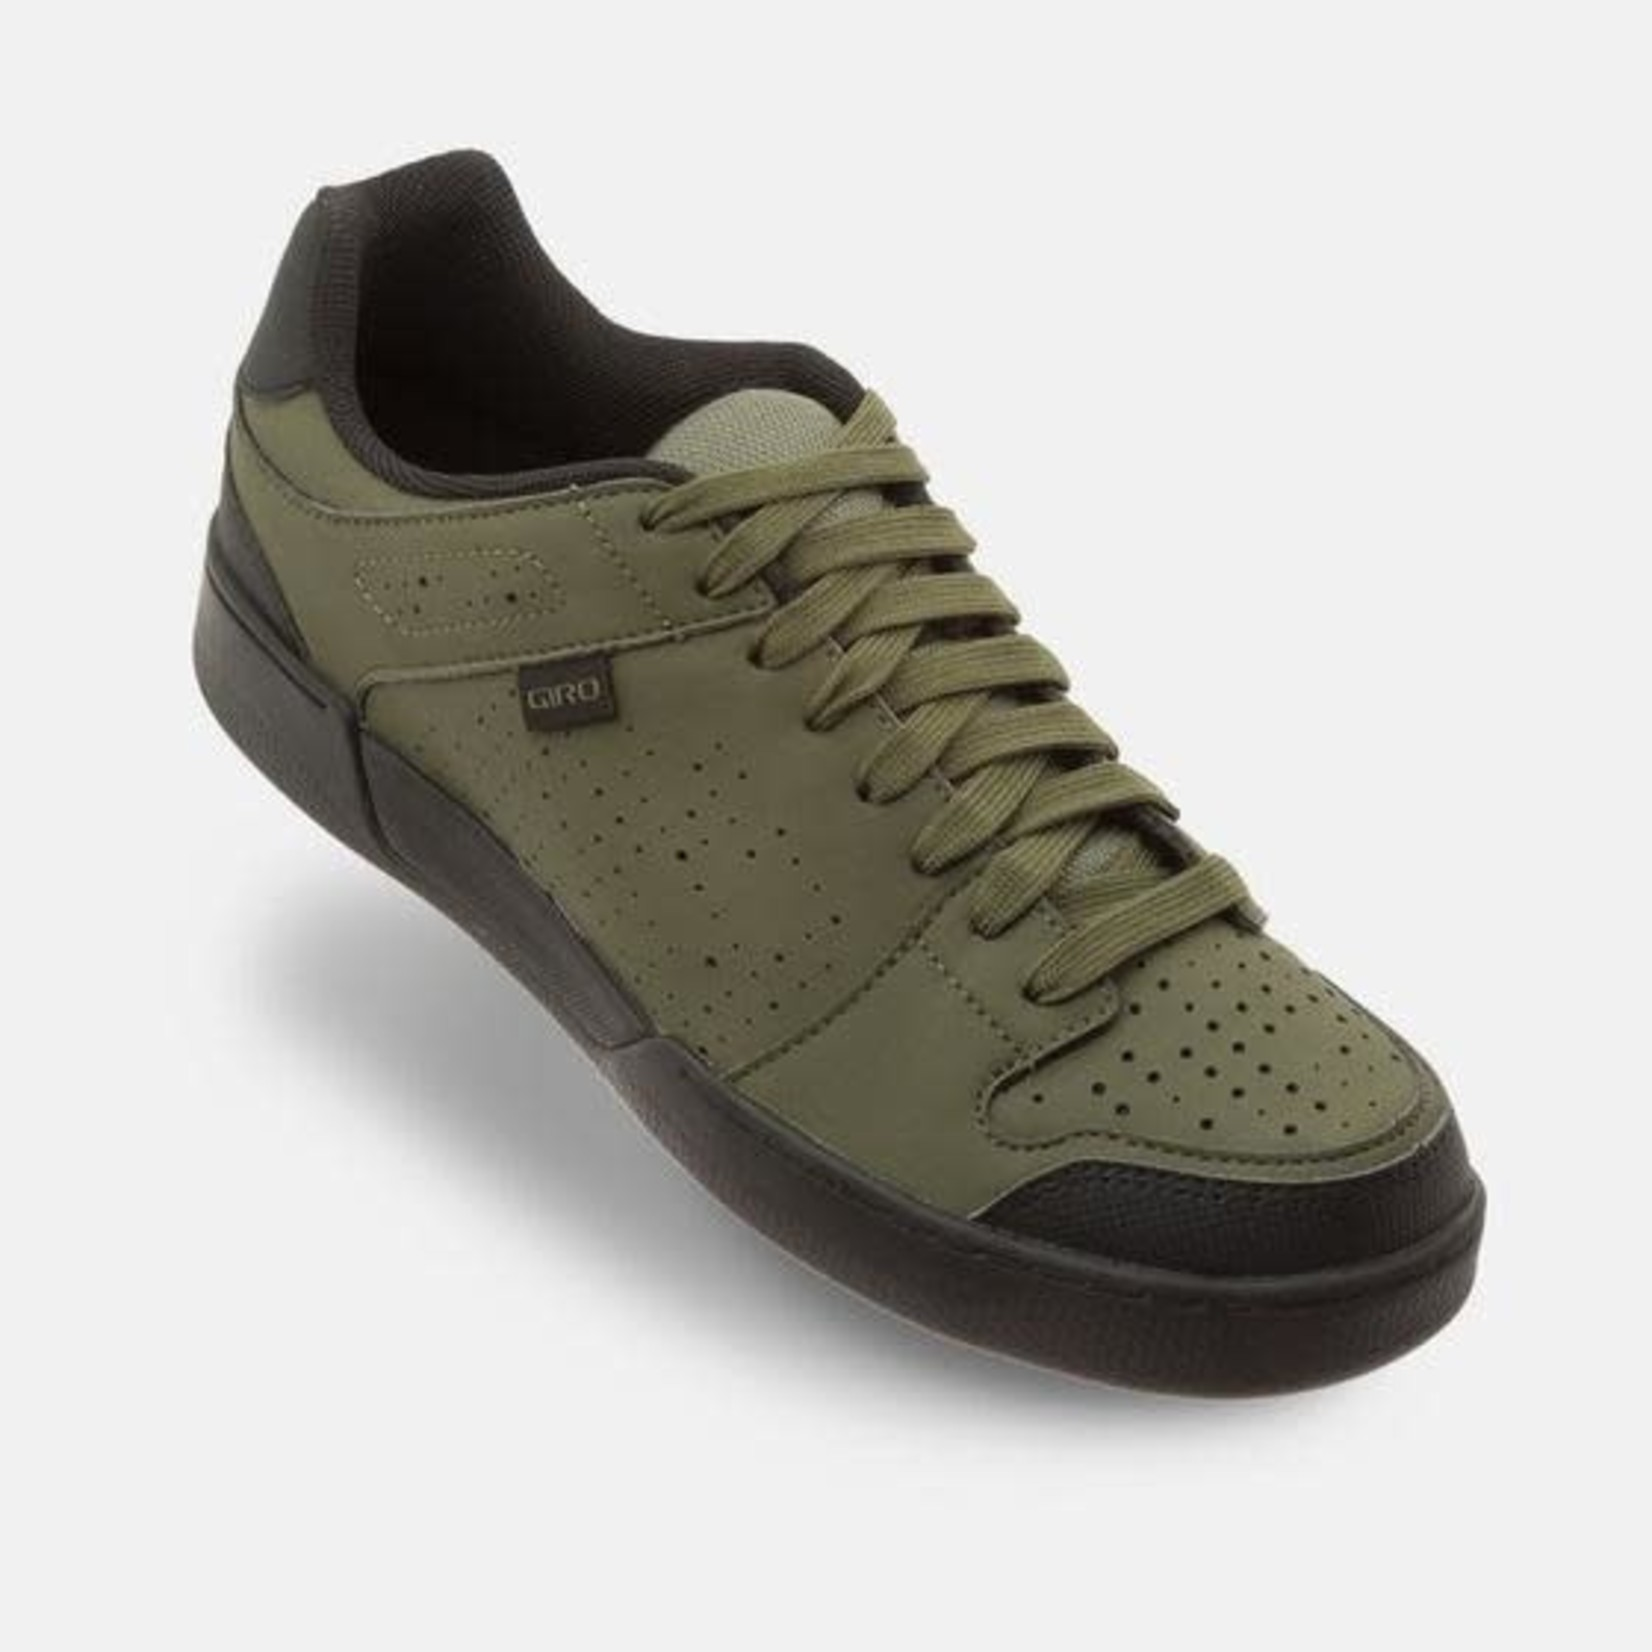 Giro Giro - scarpe Jacket II olive/black